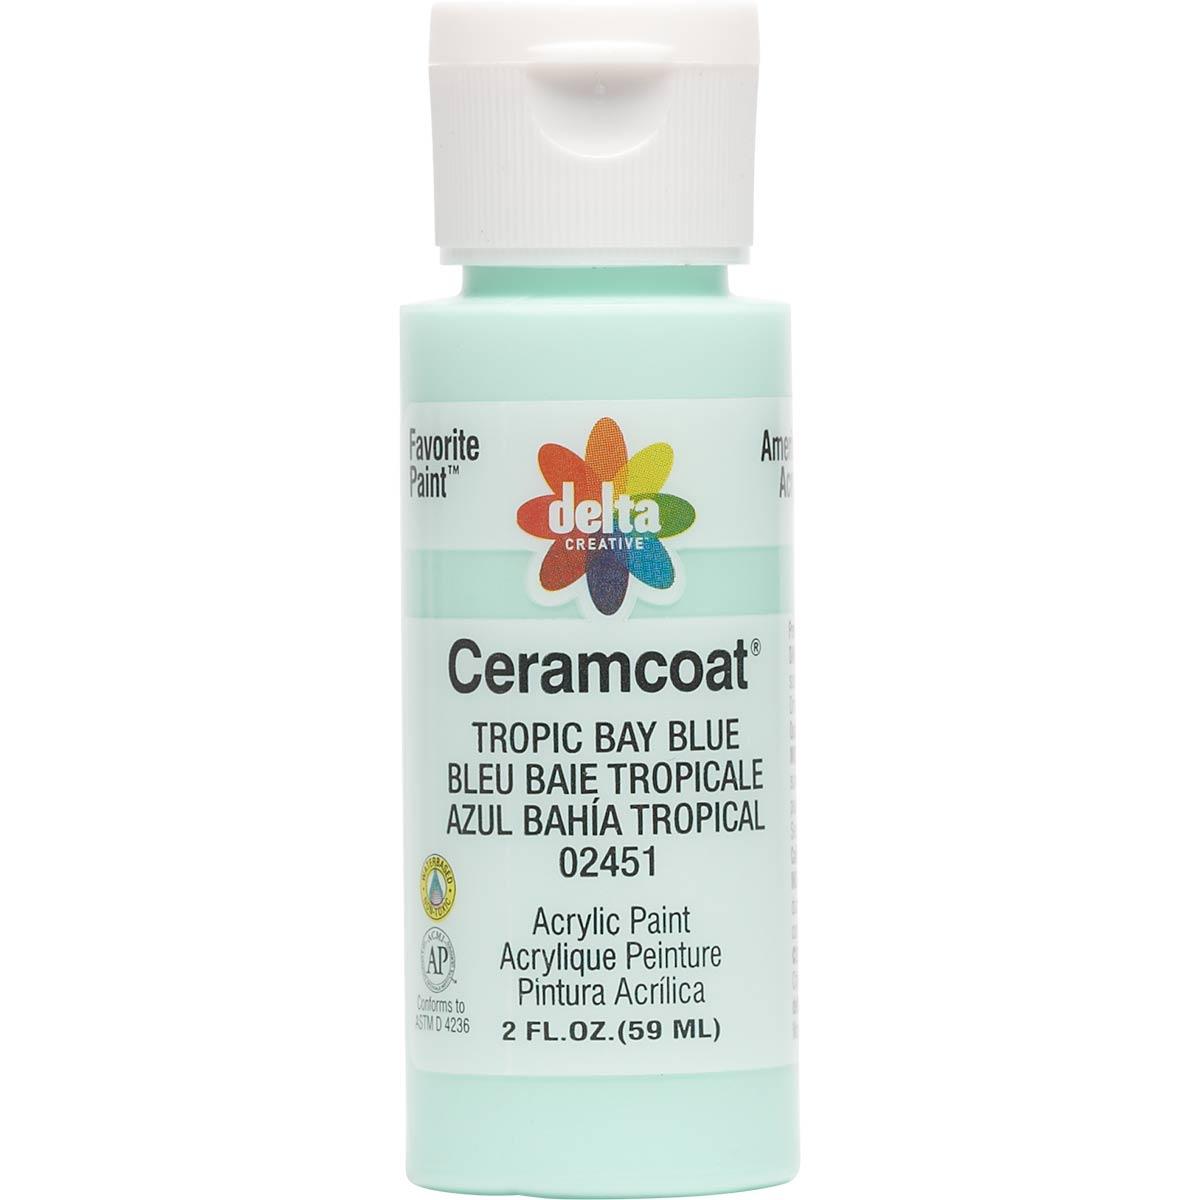 Delta Ceramcoat ® Acrylic Paint - Tropic Bay Blue, 2 oz. - 024510202W